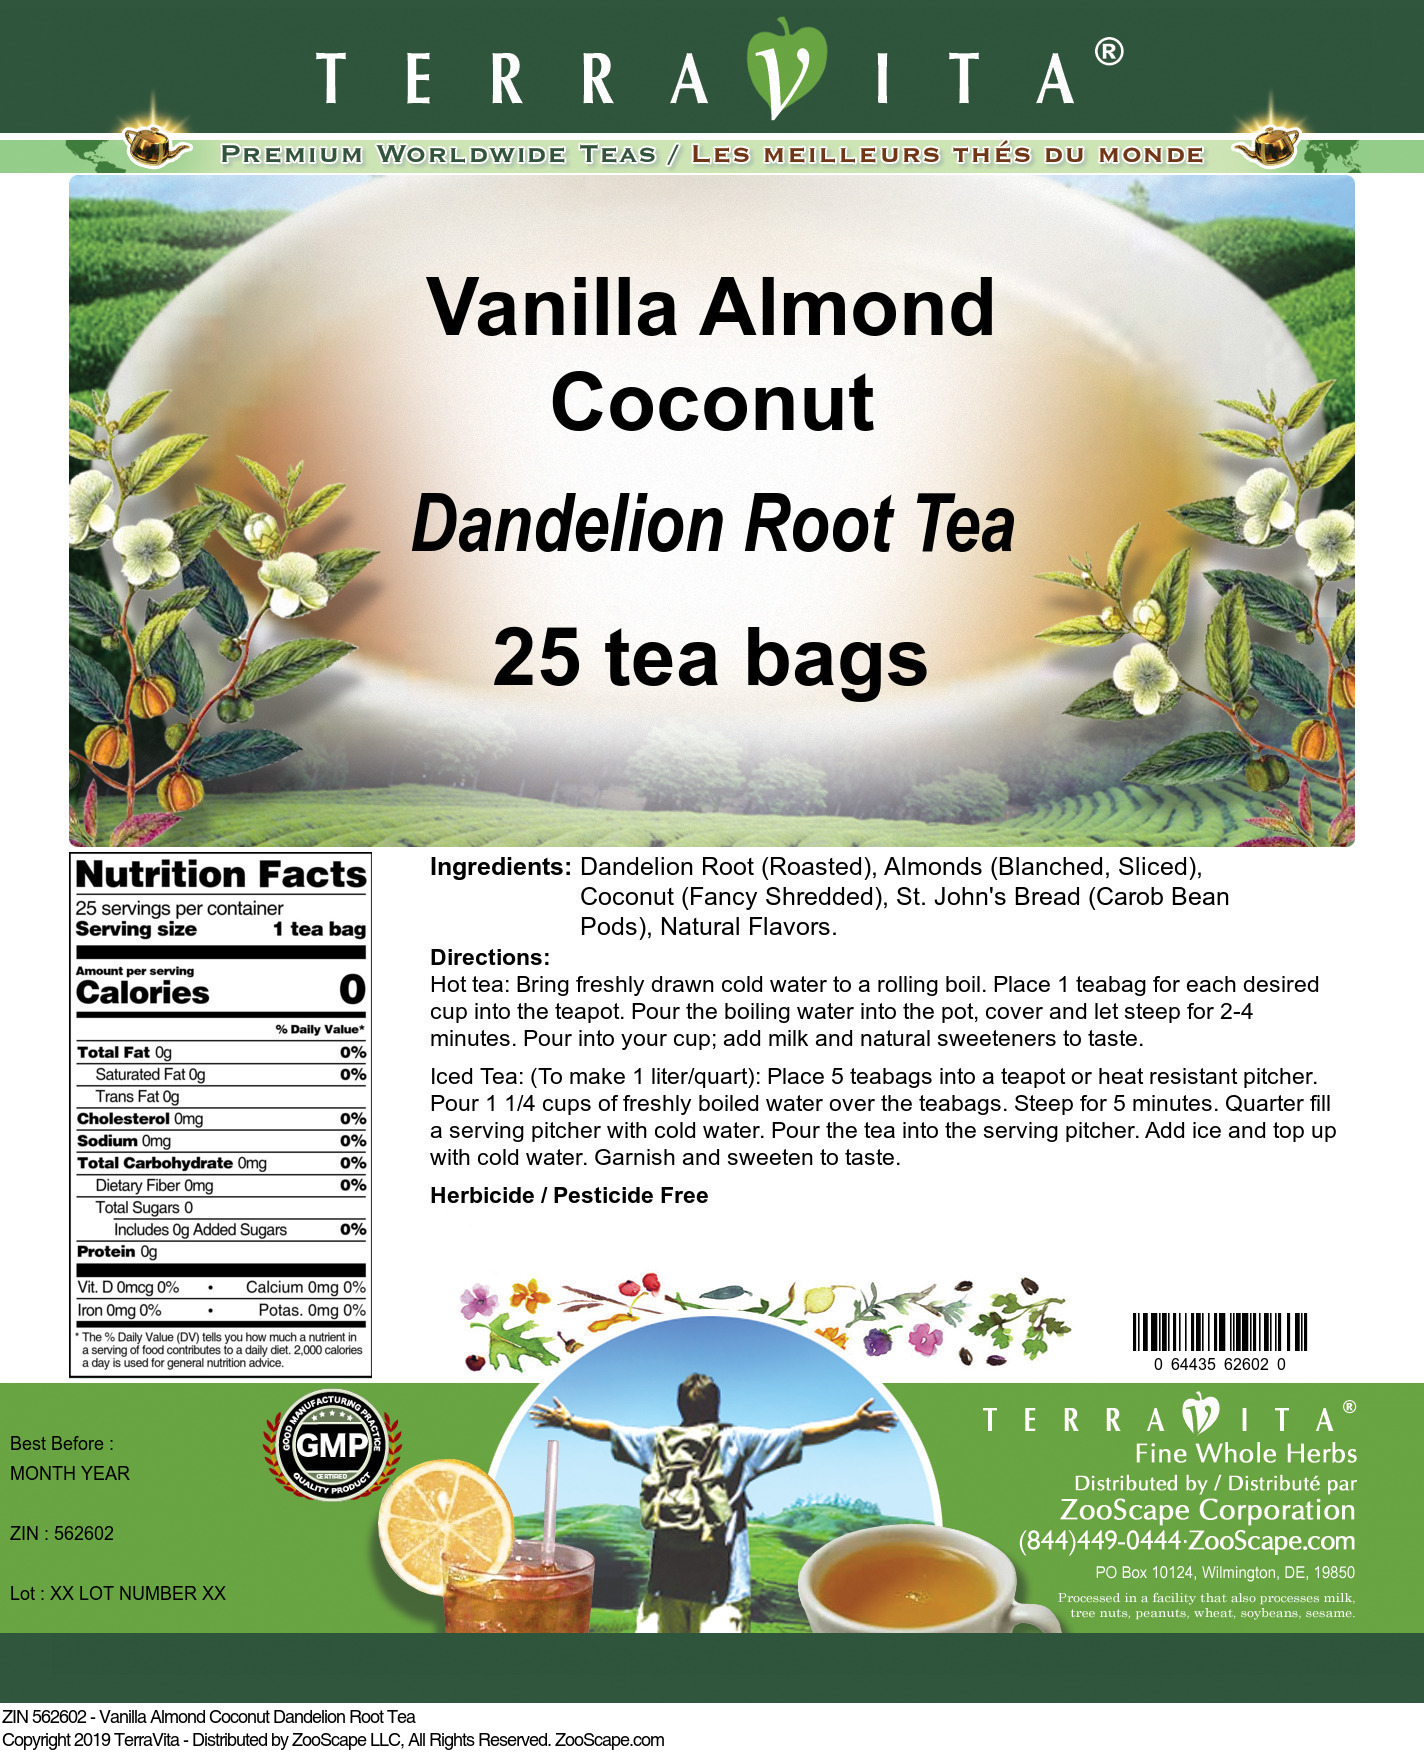 Vanilla Almond Coconut Dandelion Root Tea